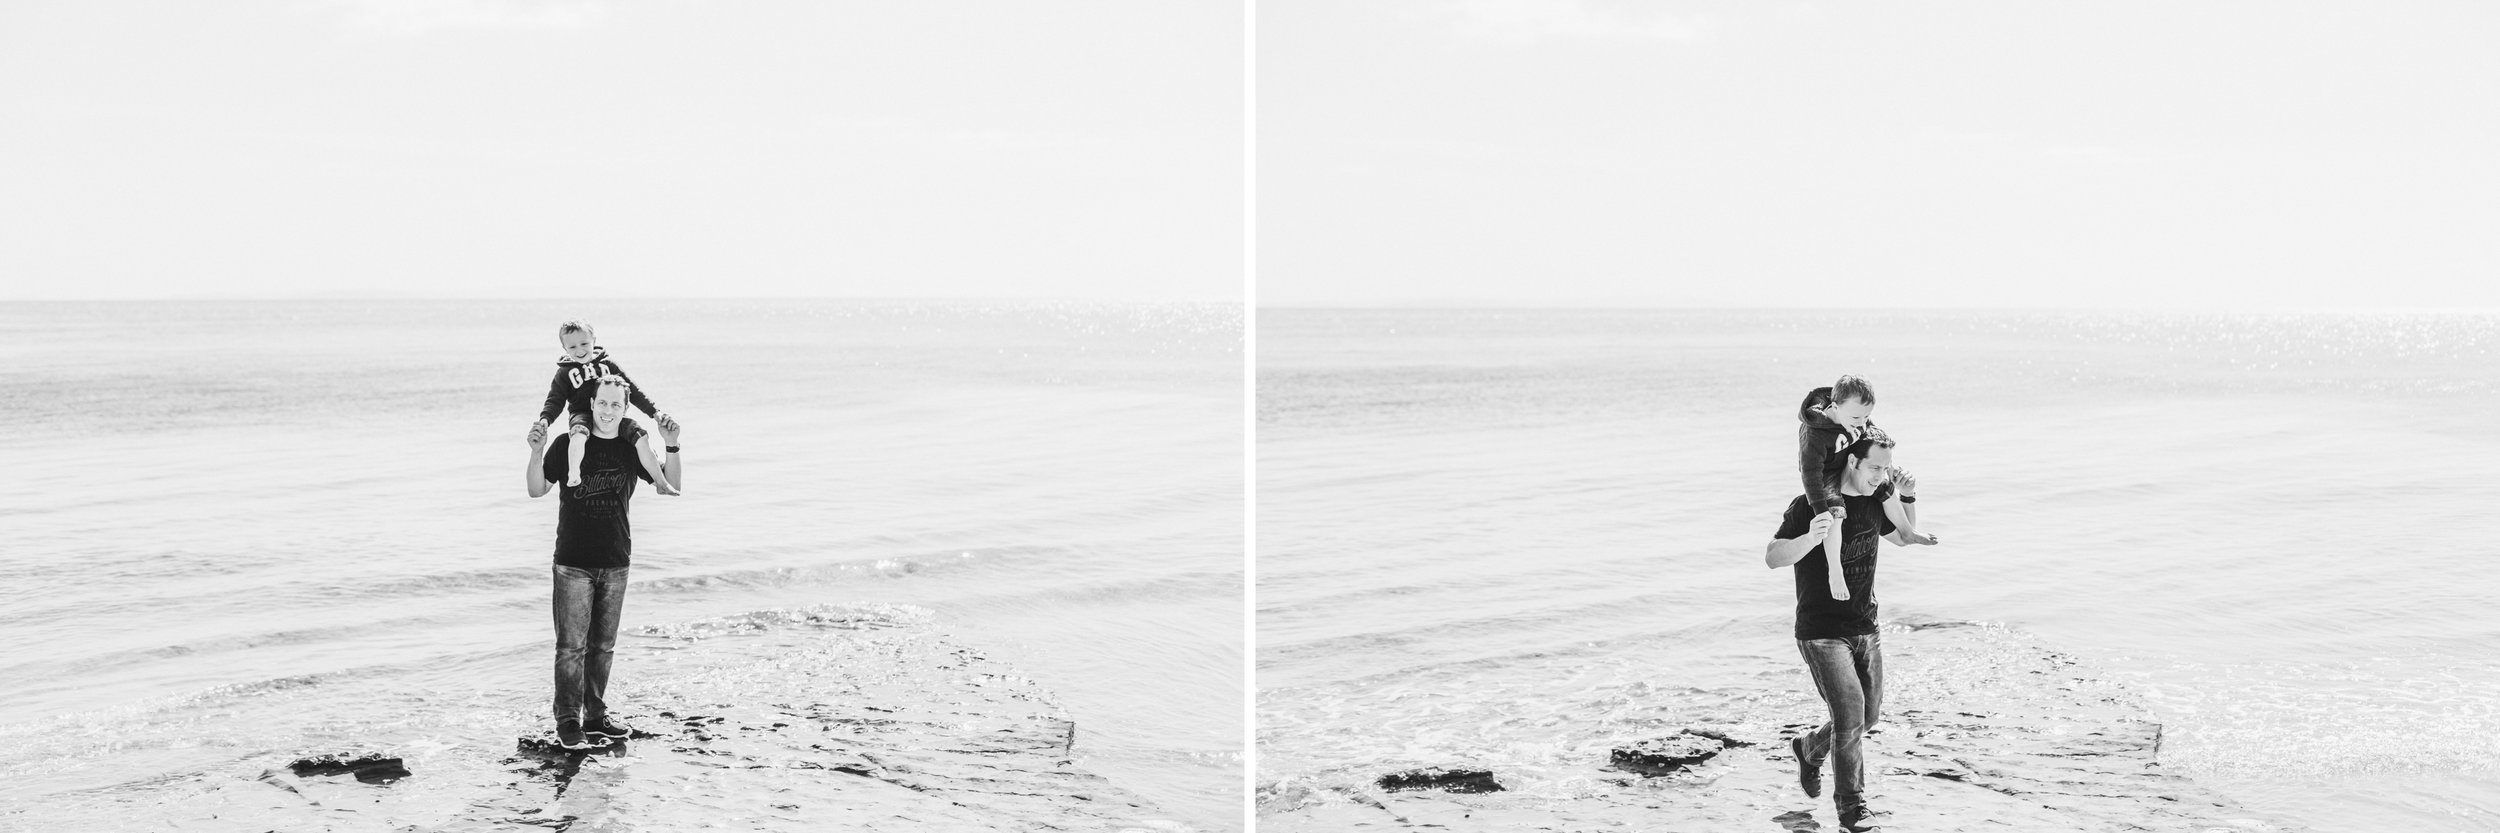 Beach family 09.jpg